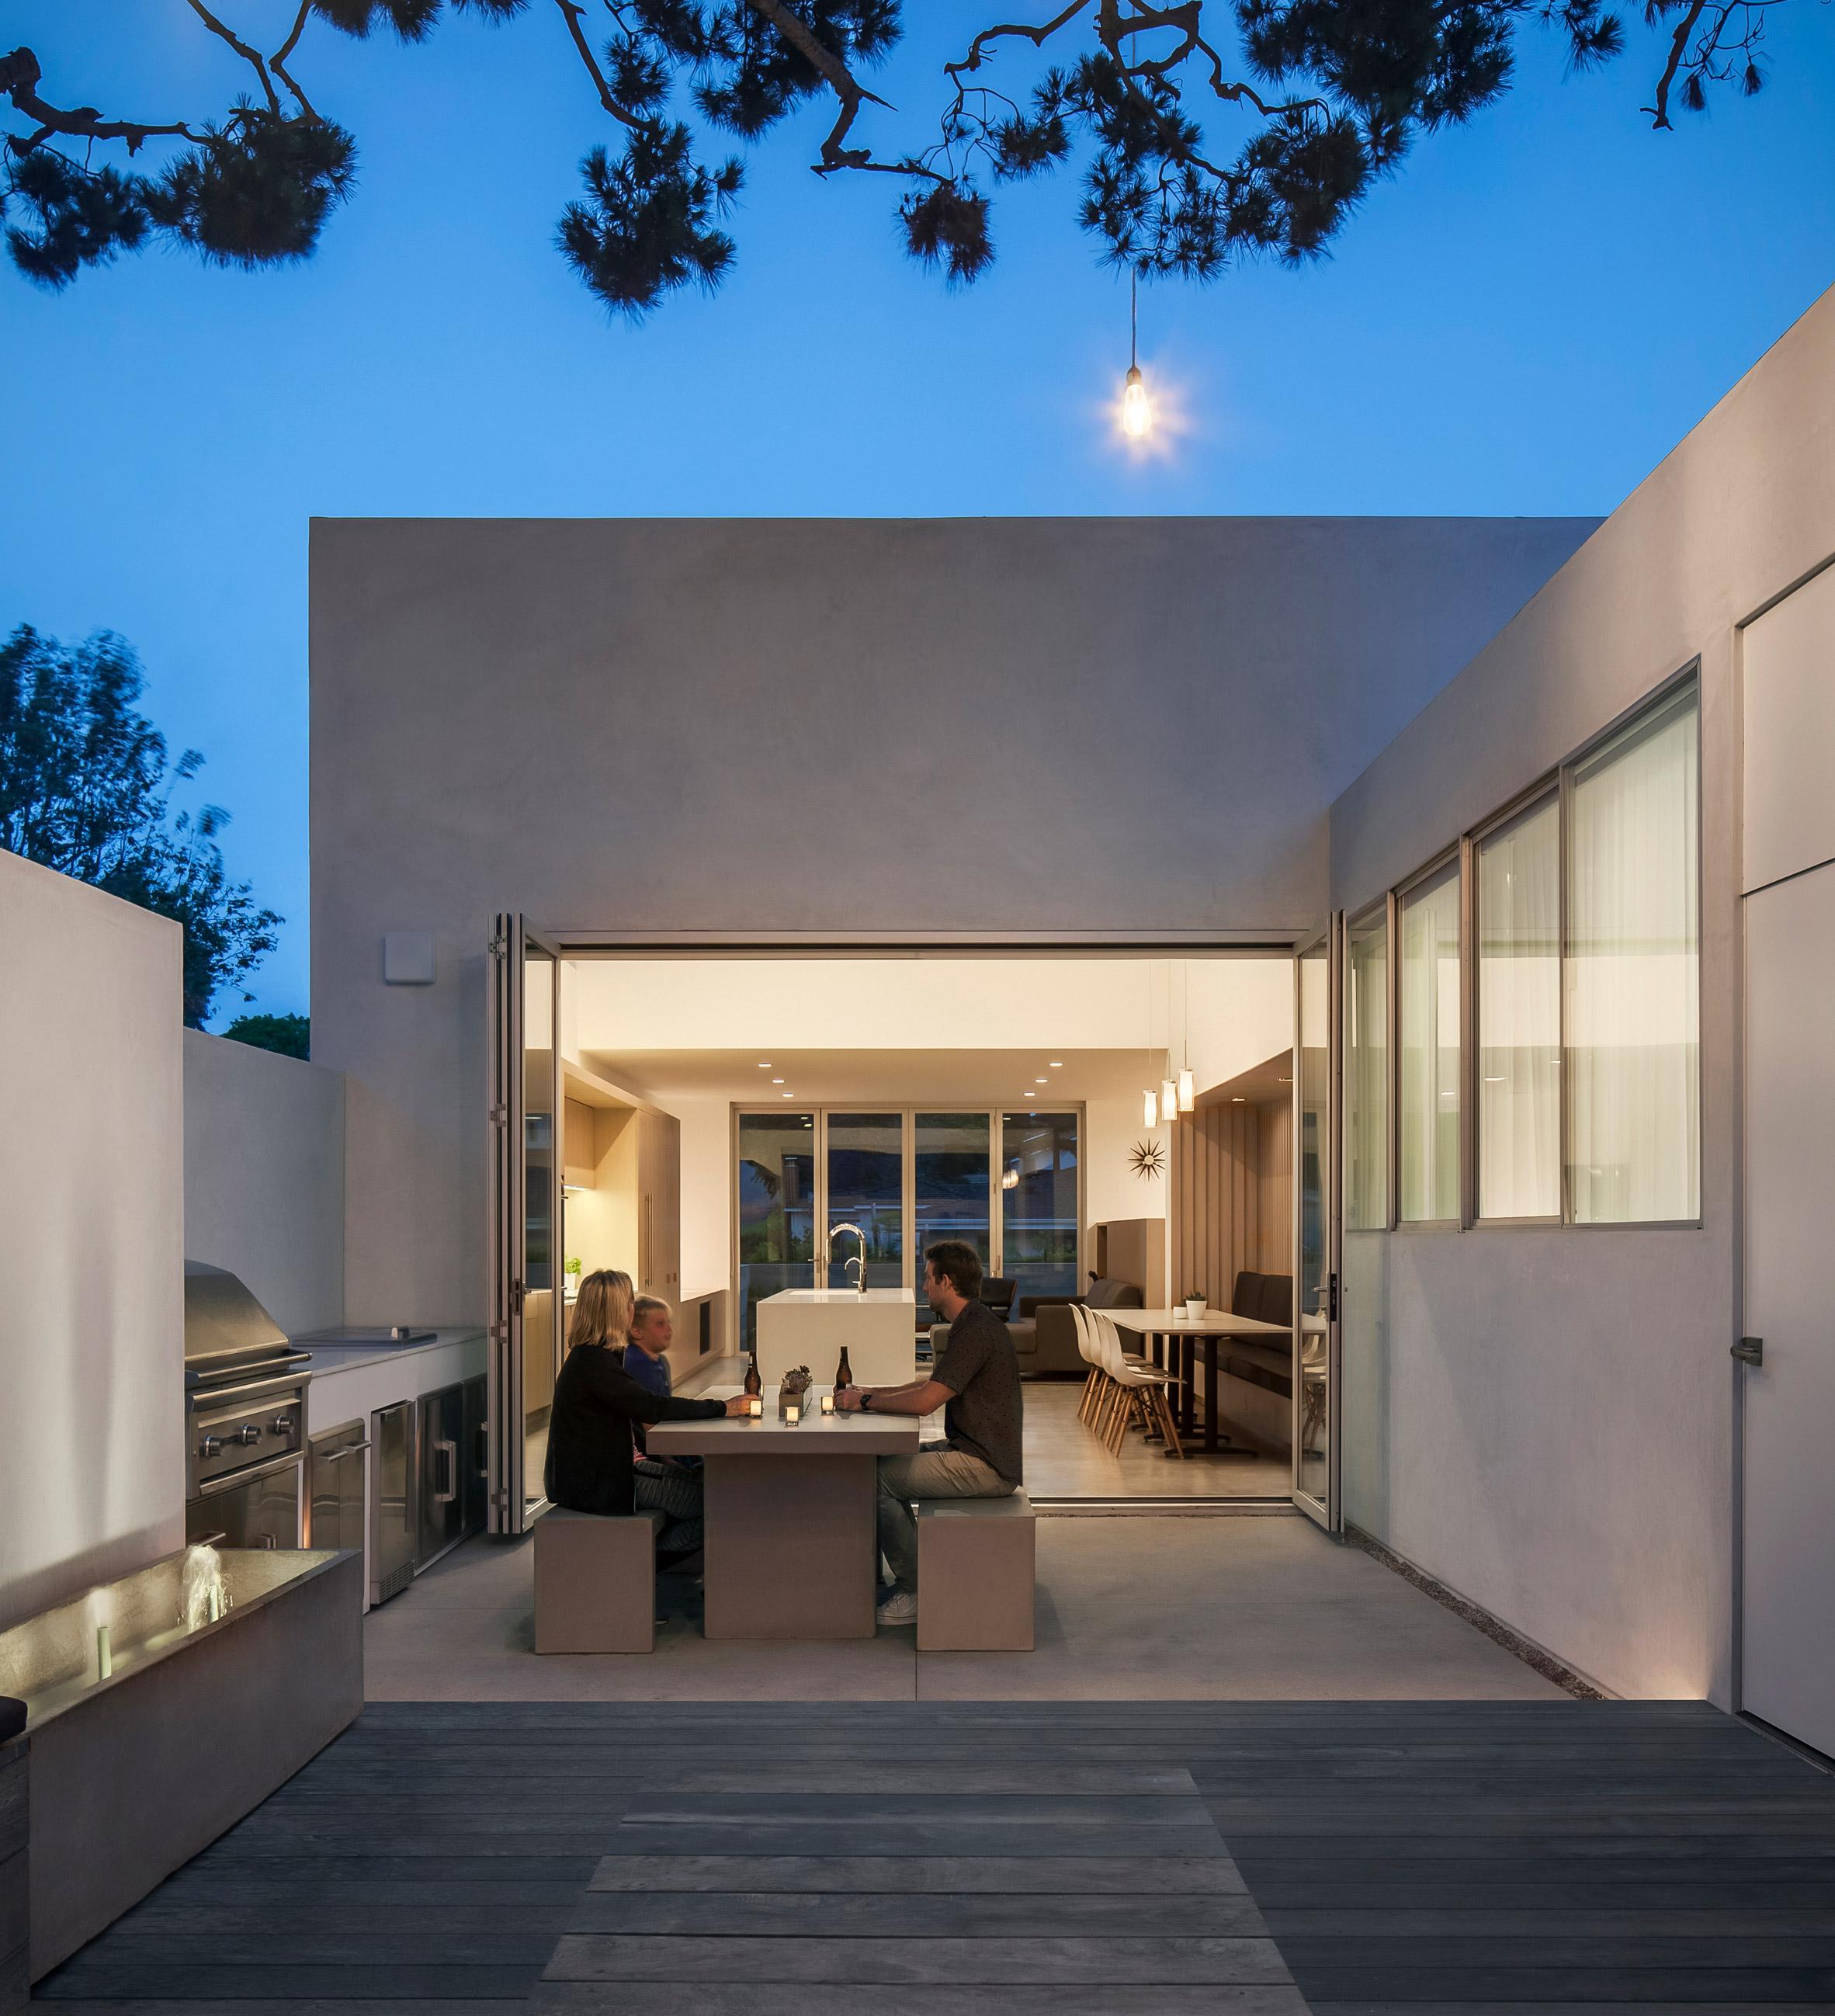 Corner Pocket House by Edward Ogosta Architecture